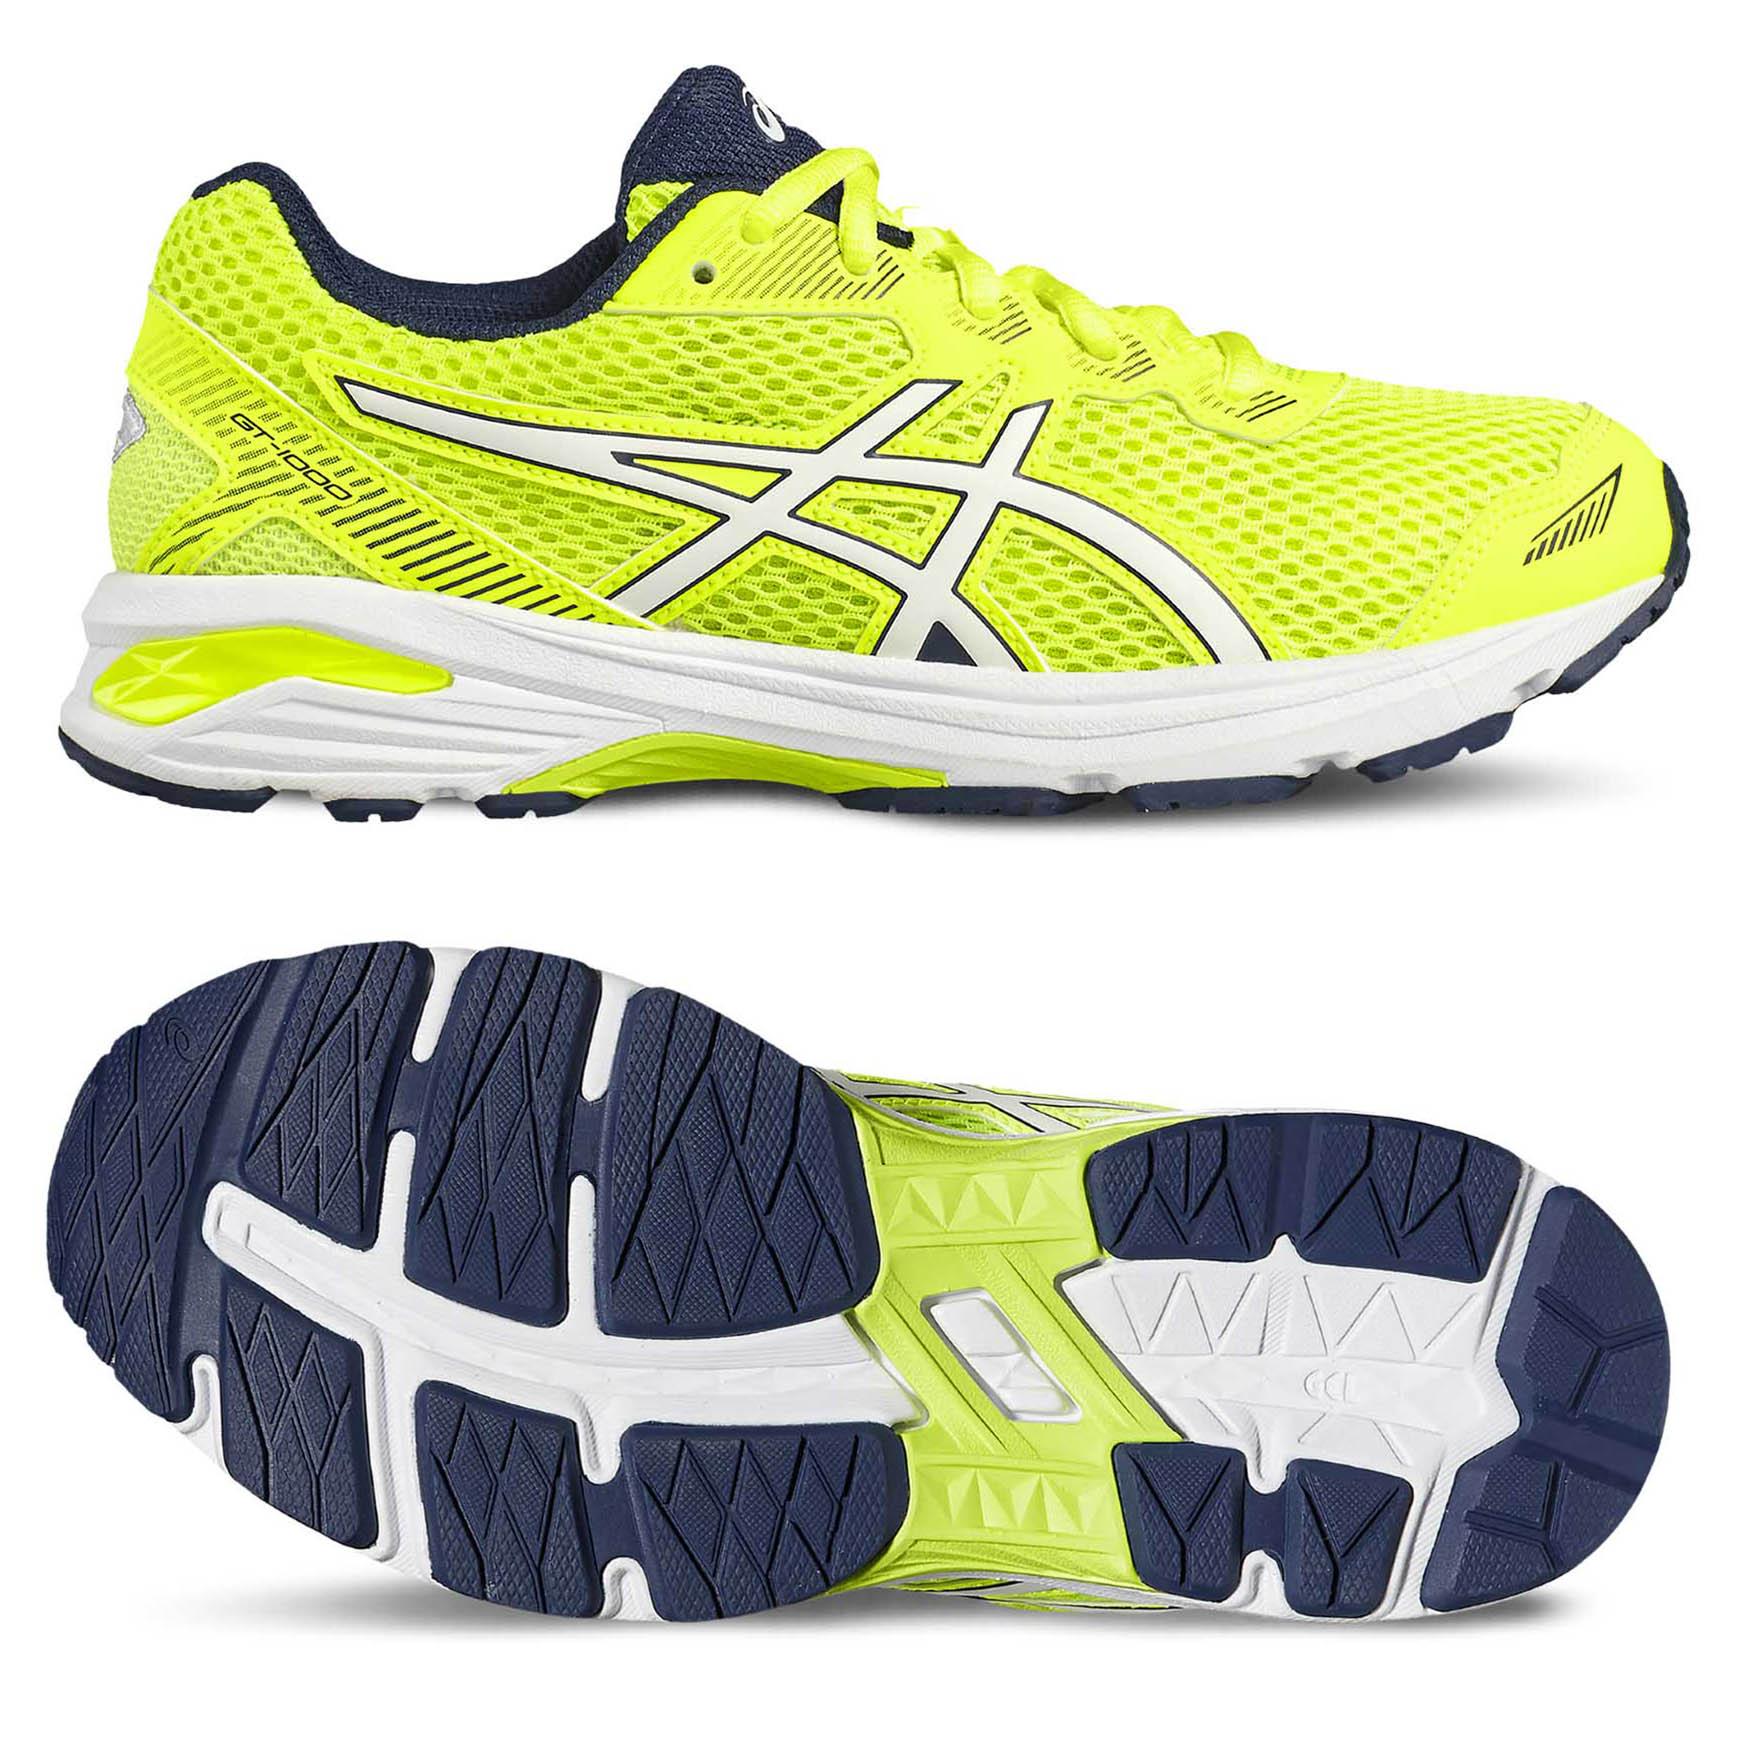 Asics GT1000 5 GS Boys Running Shoes  5 UK